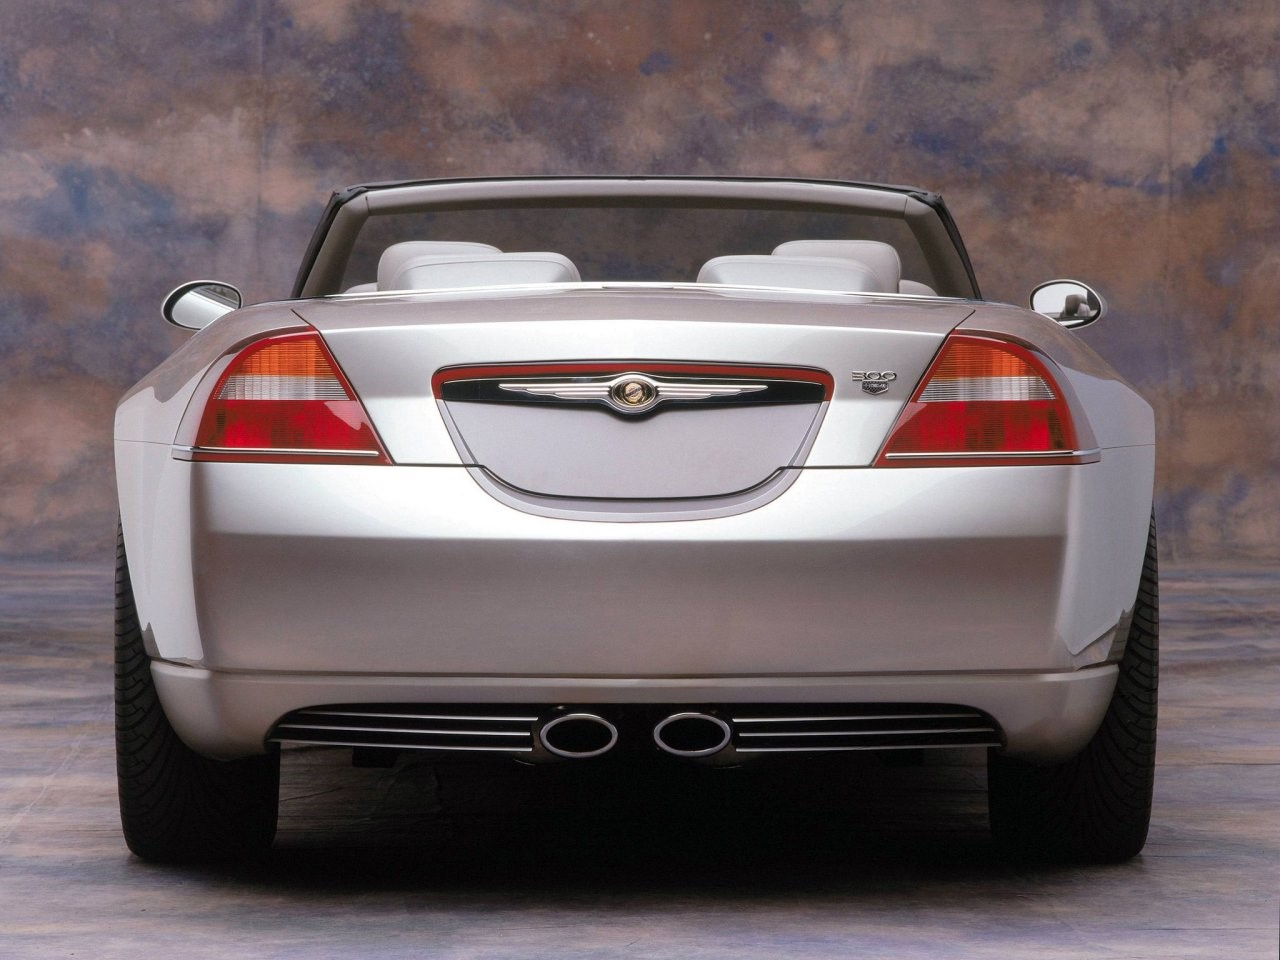 2000 Chrysler 300C concept 2